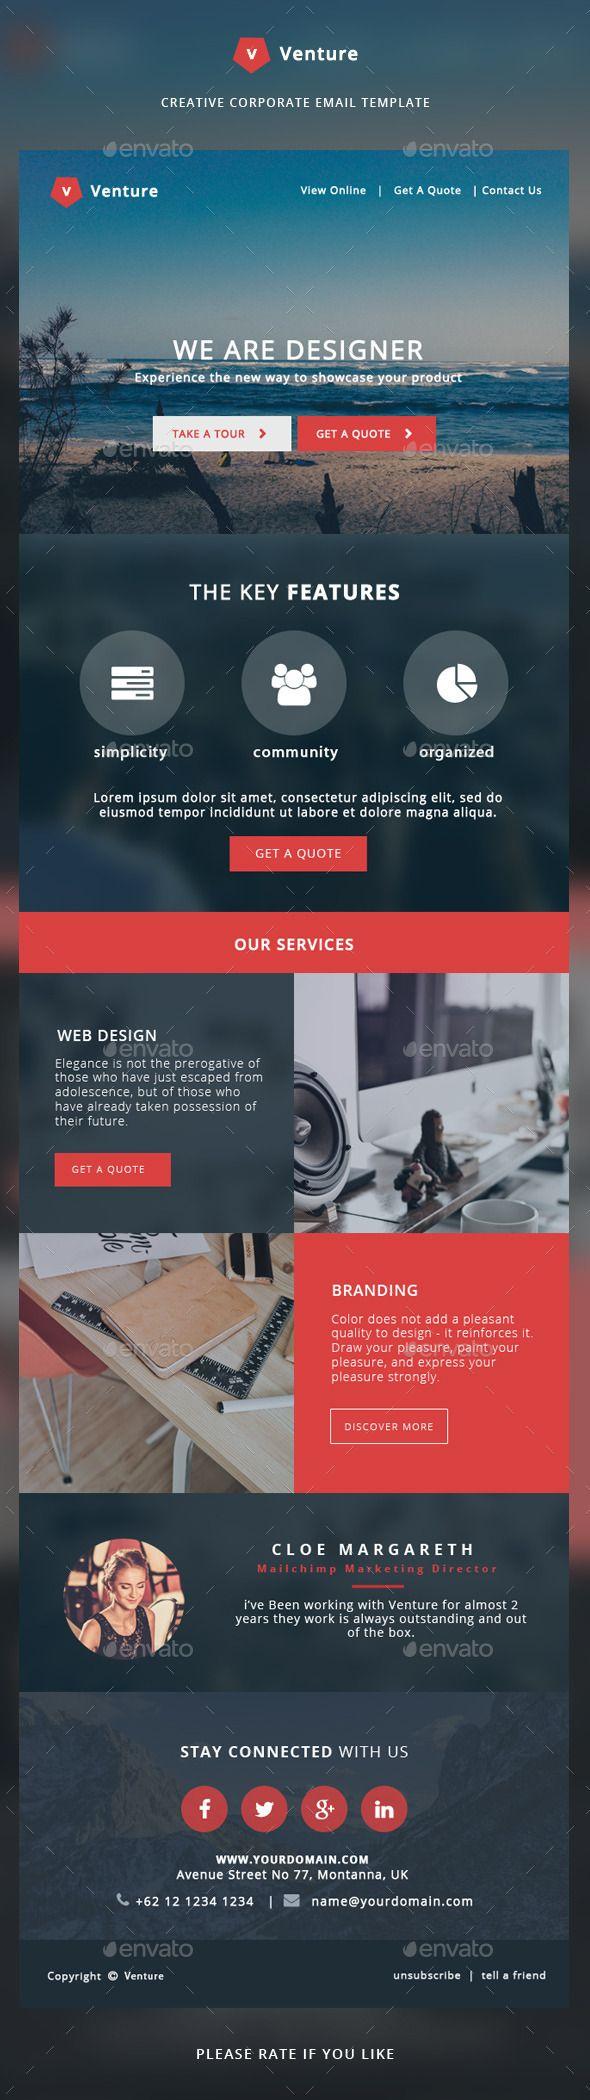 Corporate Email Template Venture Pinterest Template